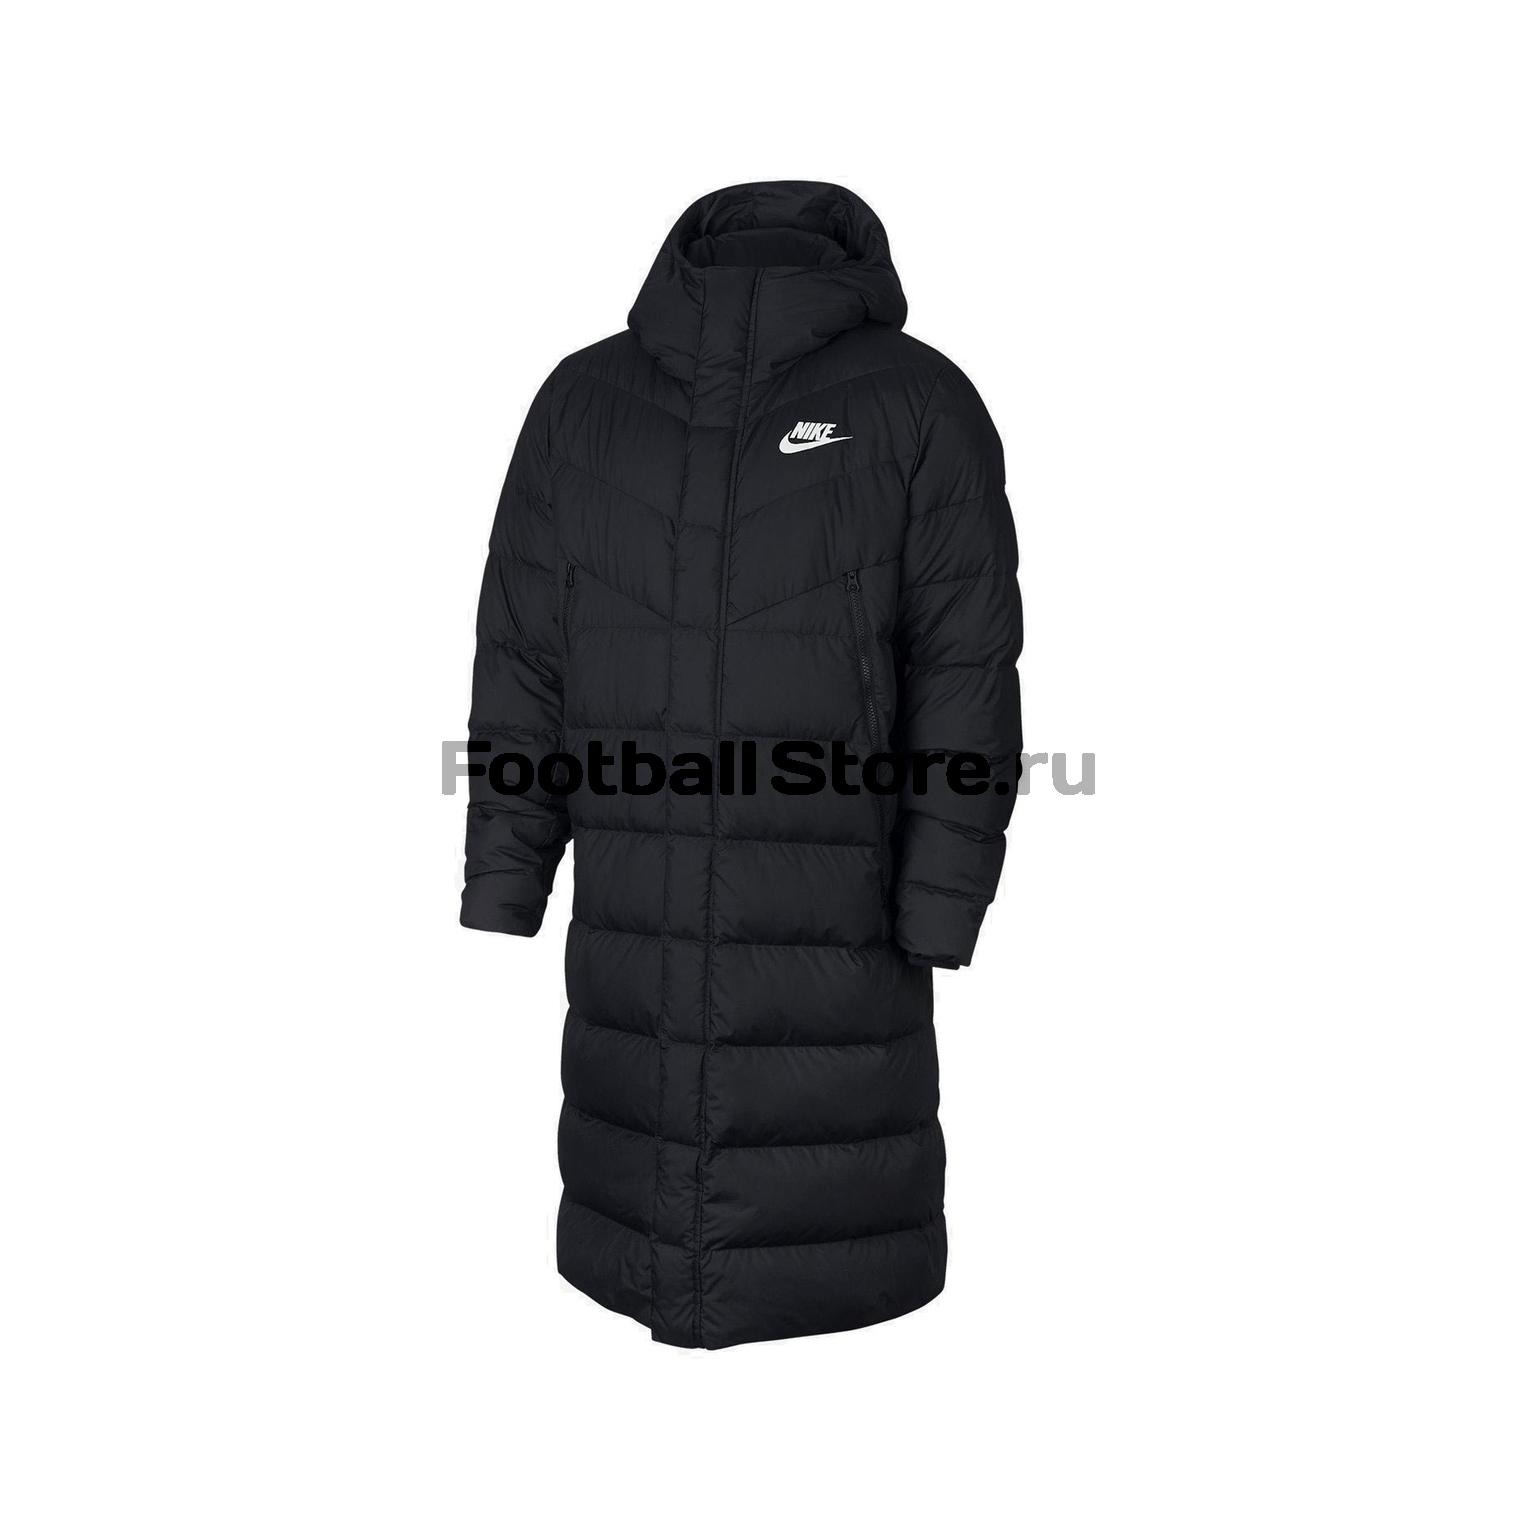 Куртка утепленная Nike Down Fill Parka AA8853-010 куртка nike windrunner jkt 928833 010